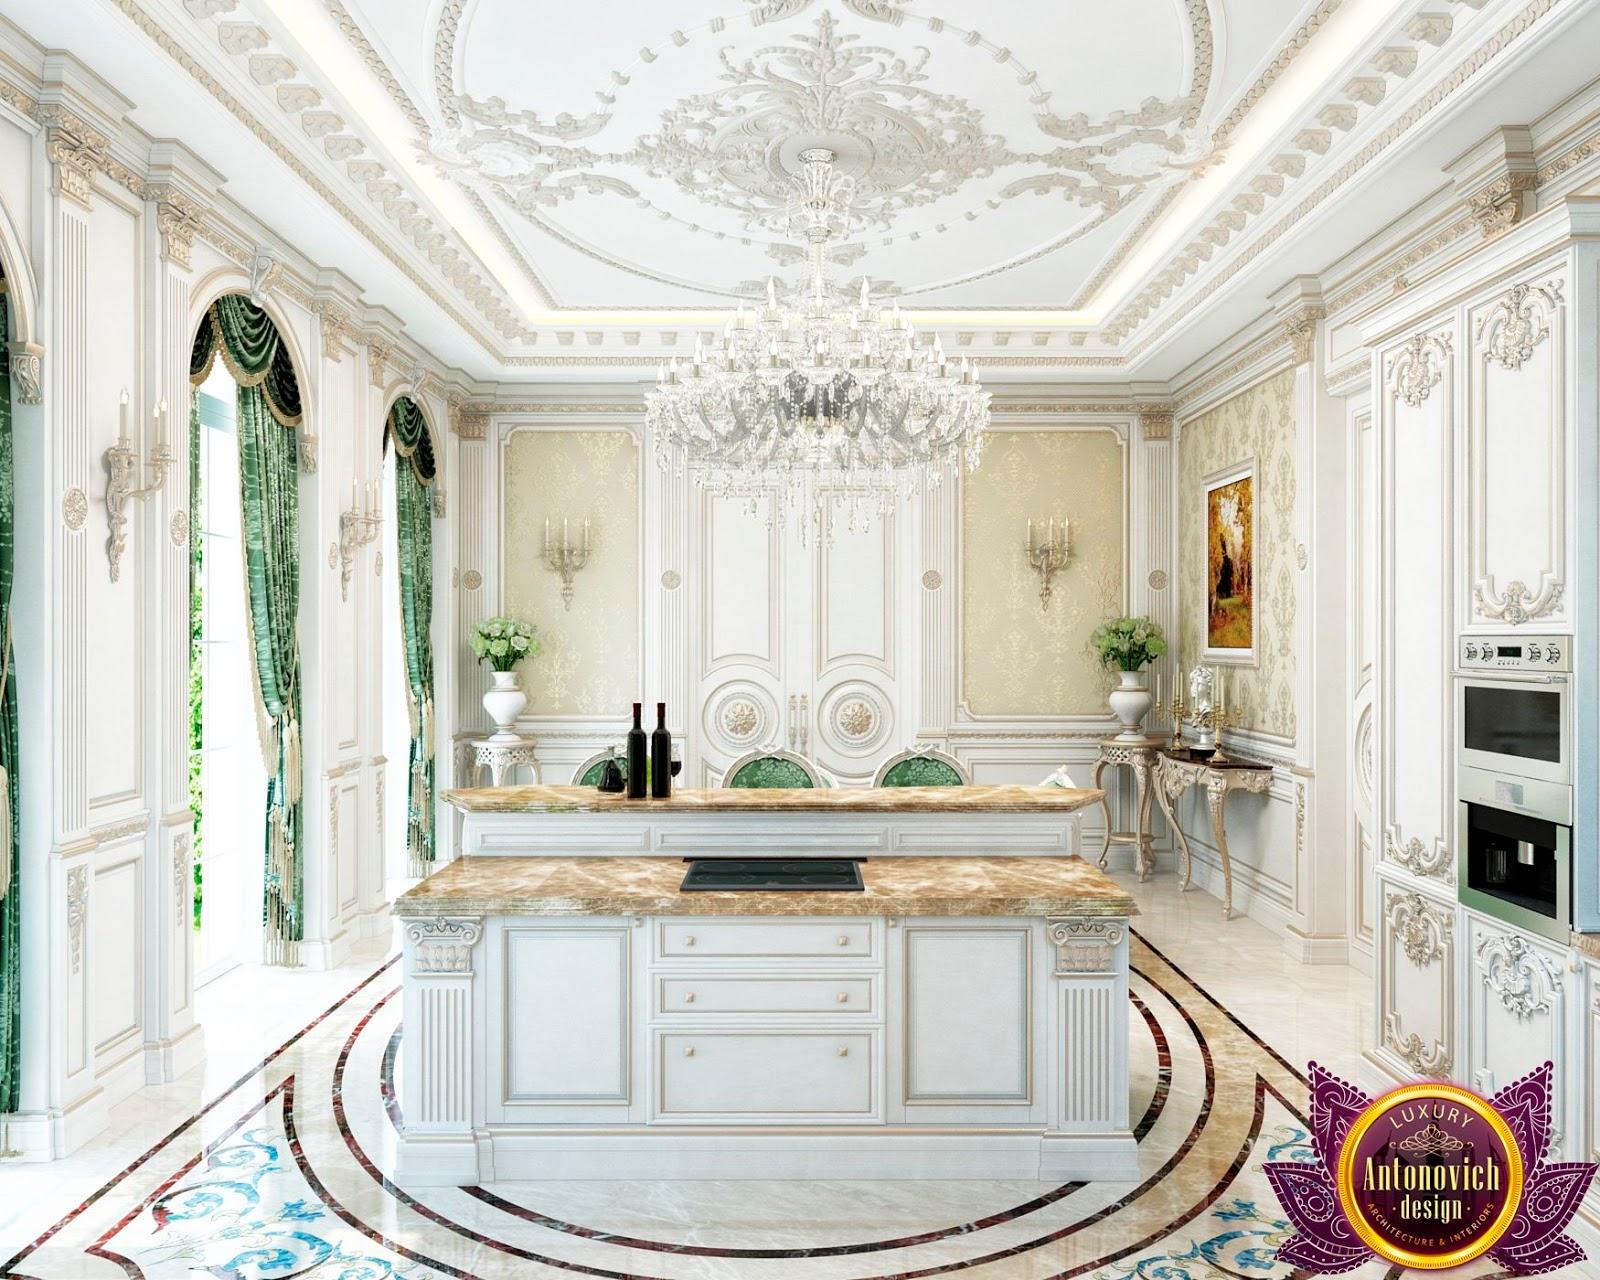 Kitchen Design Usa By Katrina Antonovich: Kenyadesign: Luxury And Functionality Kitchen Interior